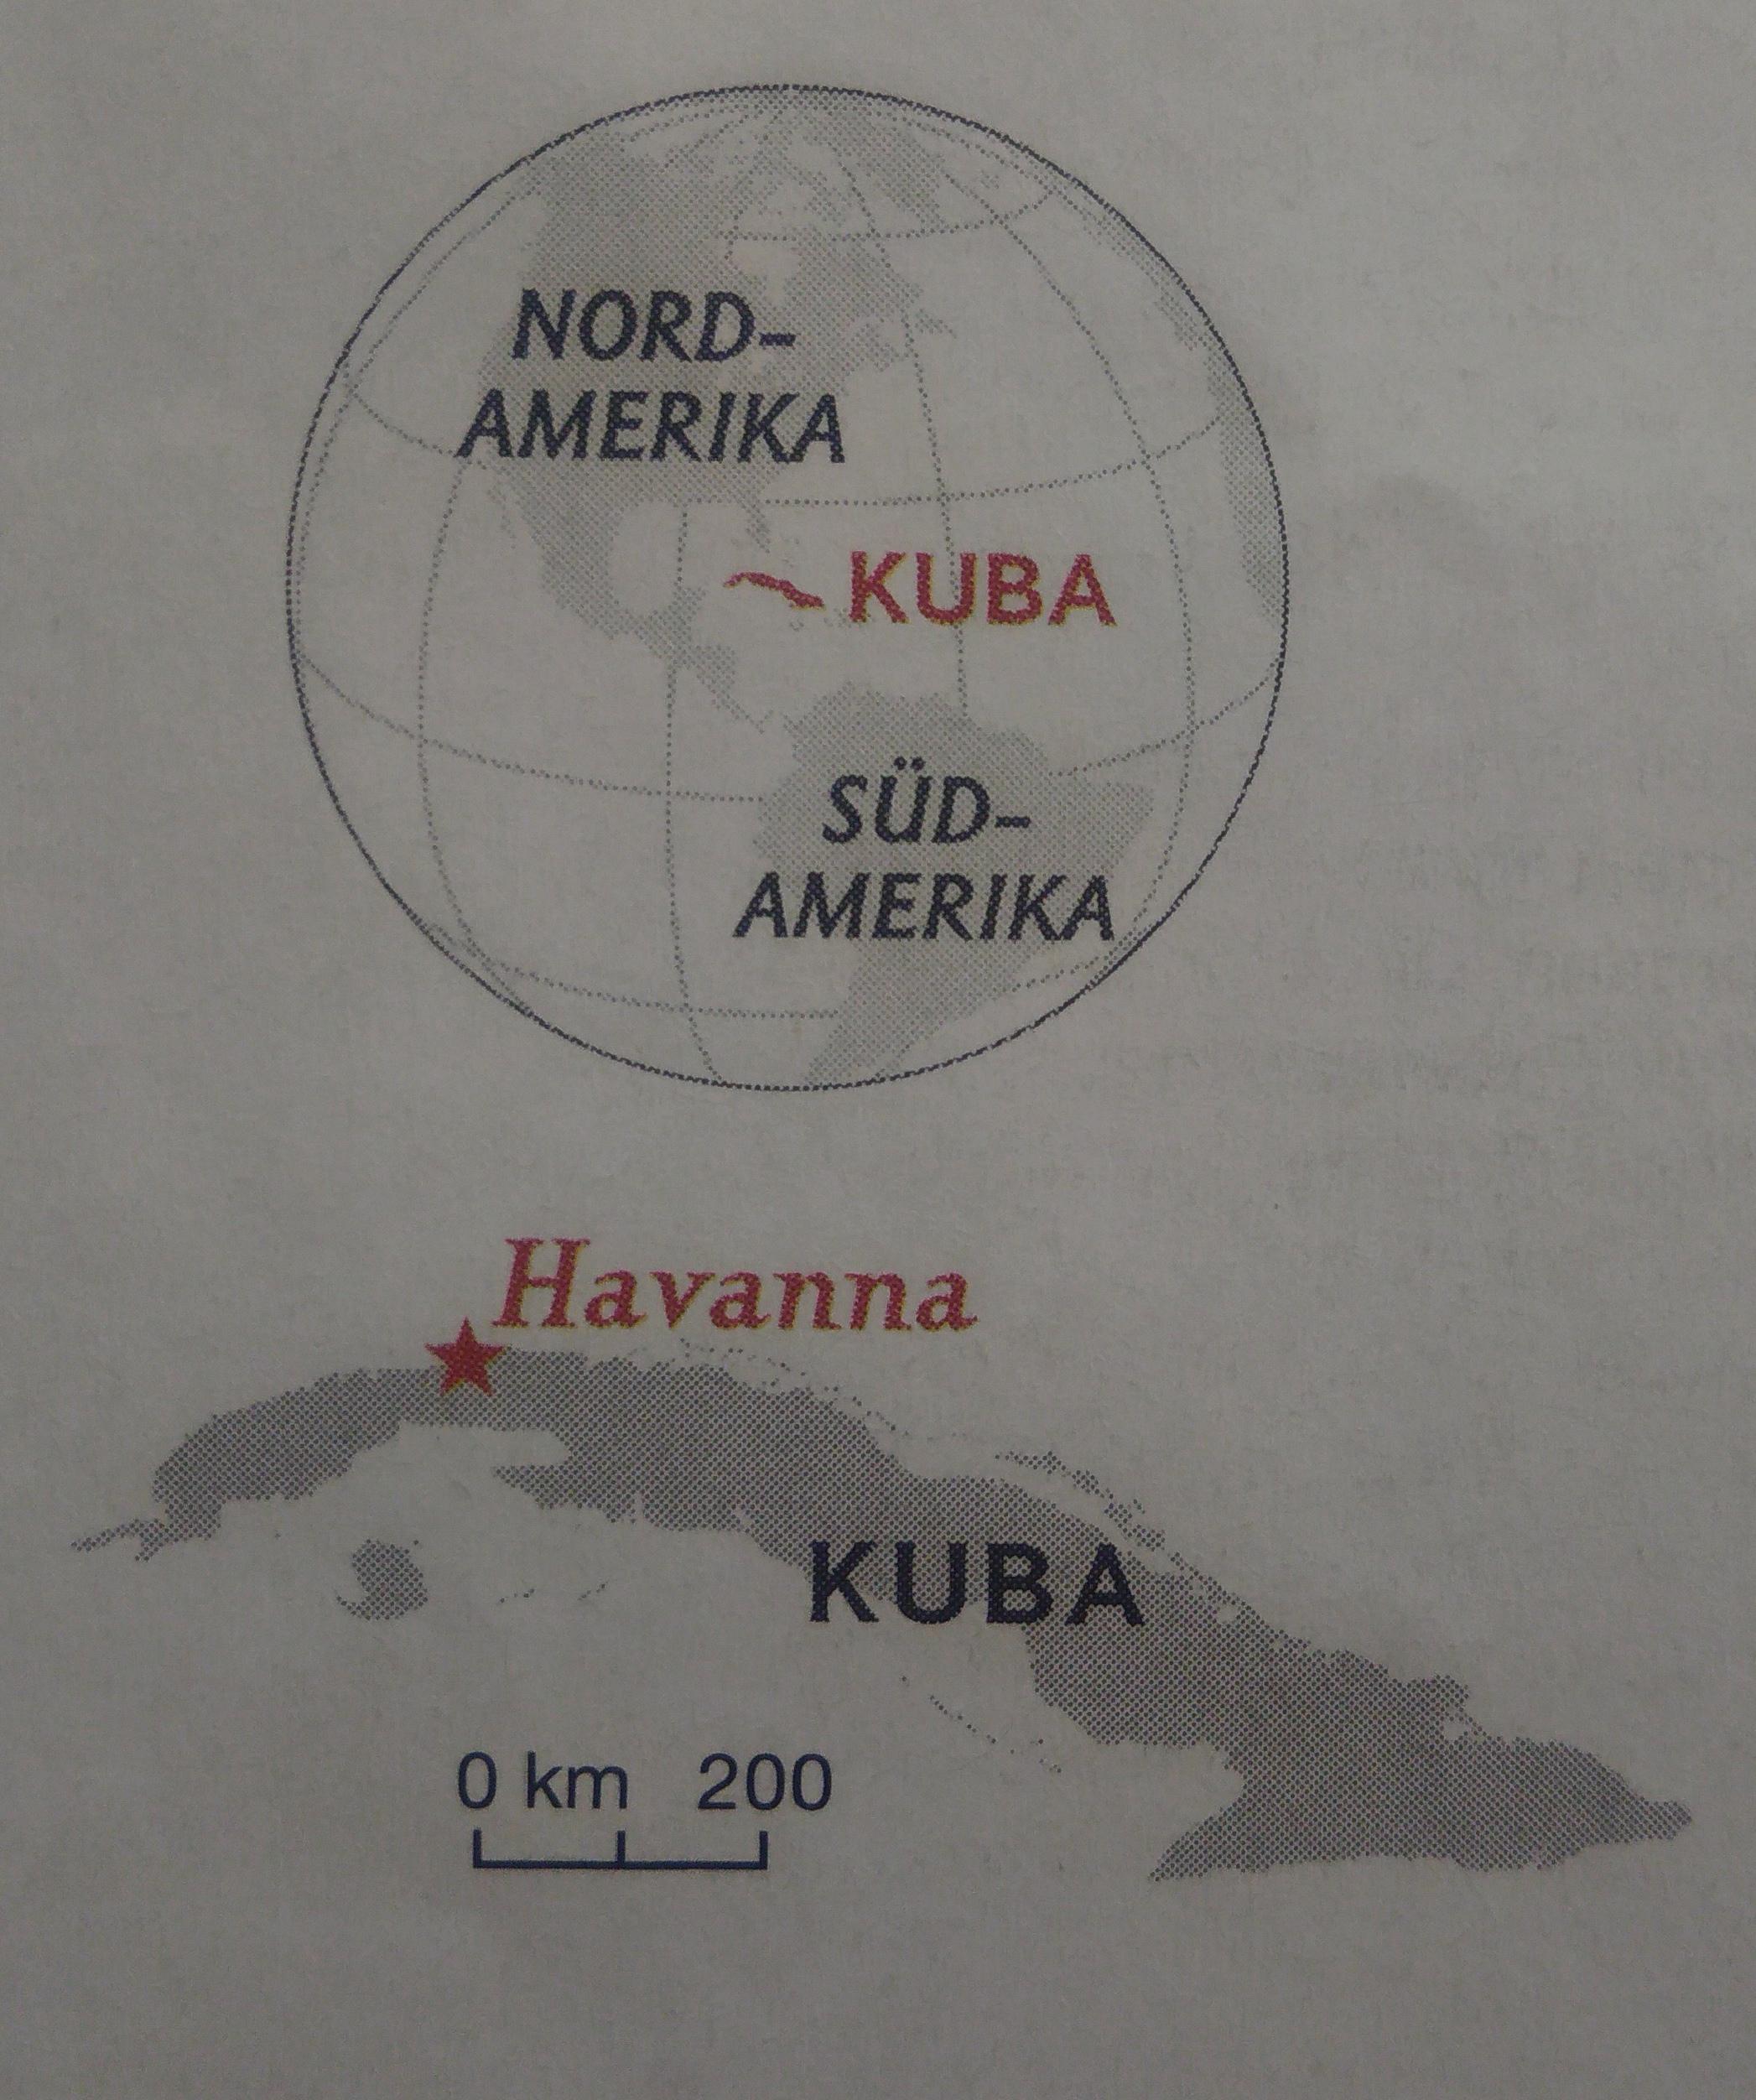 000 Karte Kubajpg